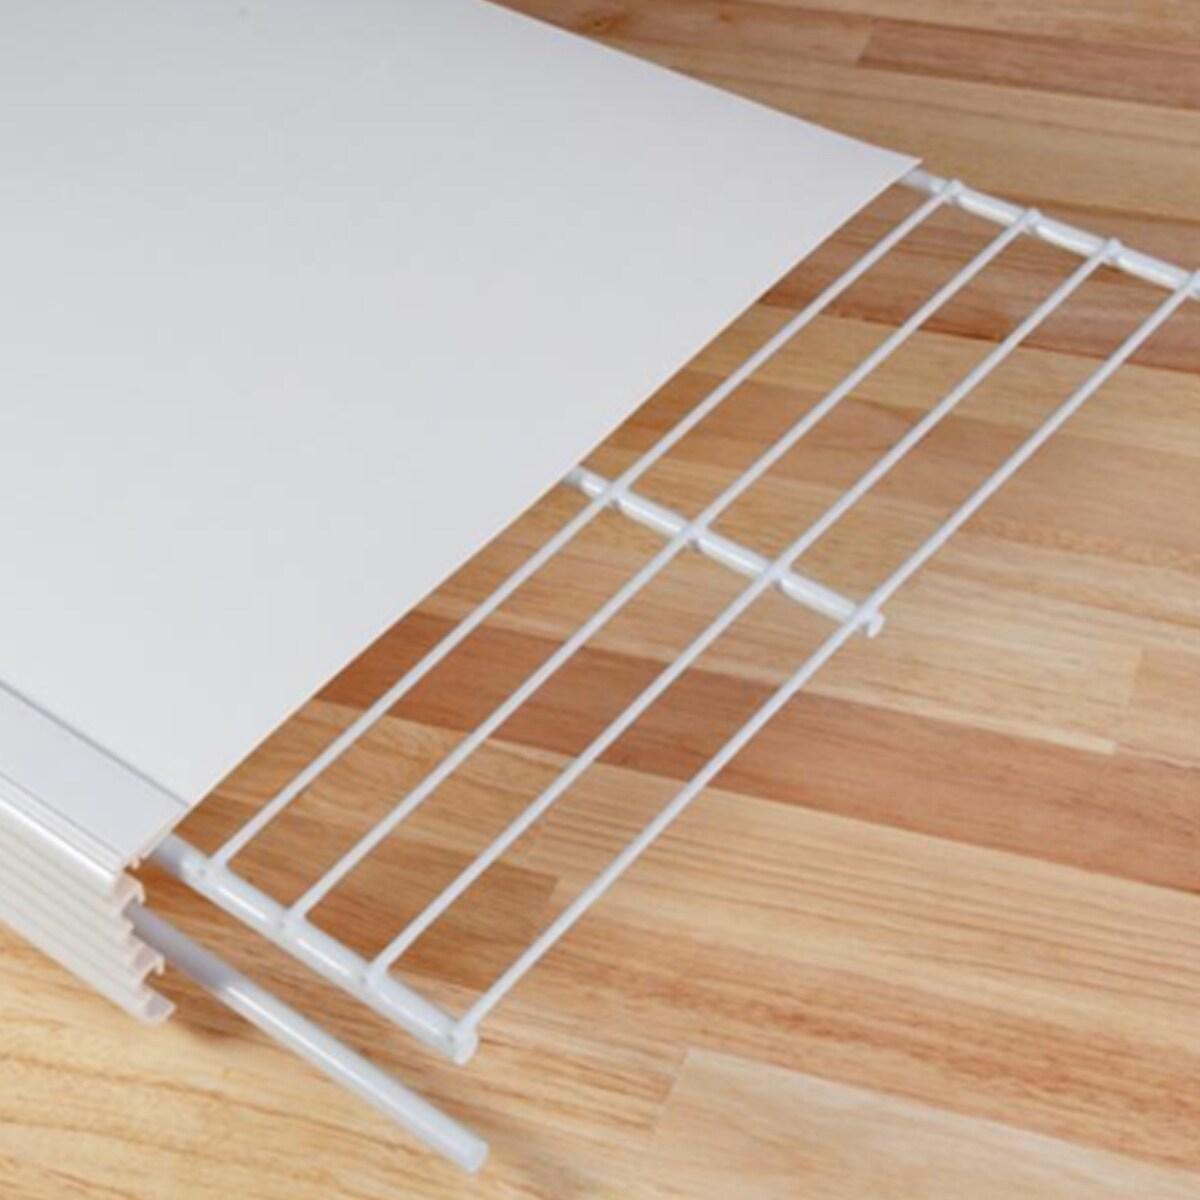 Groovy Help Myshelf 20 Inch Wire Shelf Cover And Liner Kit For 3 Shelves Home Remodeling Inspirations Gresiscottssportslandcom